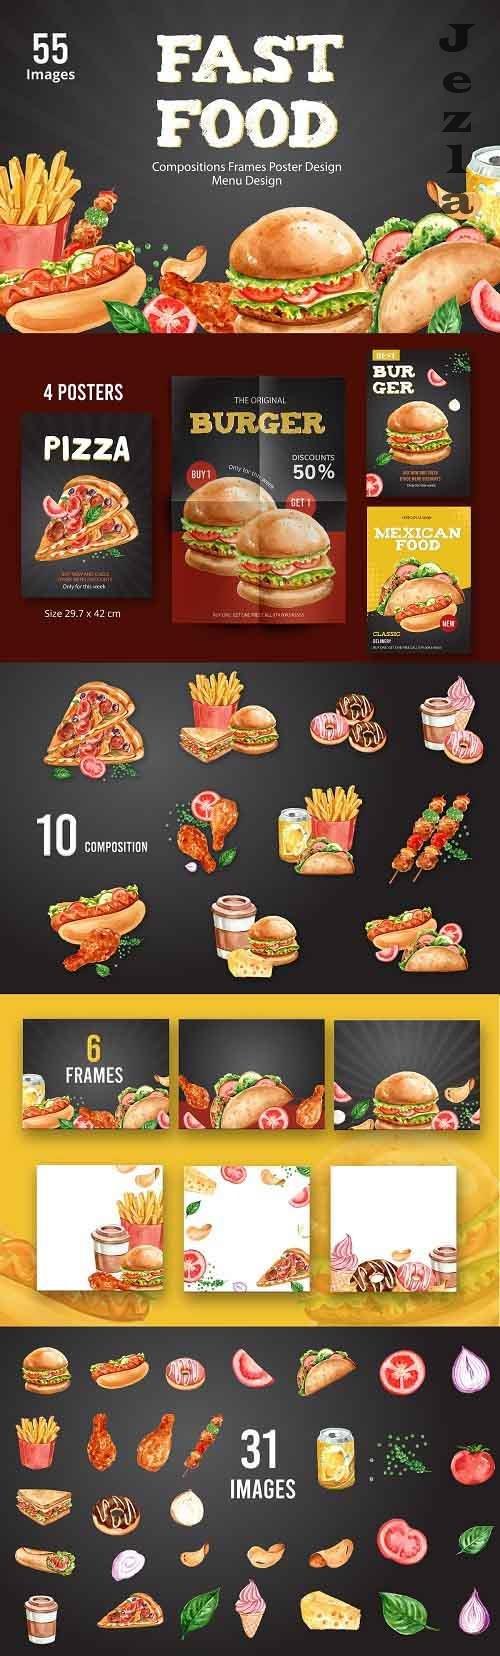 Fast Food and dessert sweet bake Watercolor Illustration set - 5712951